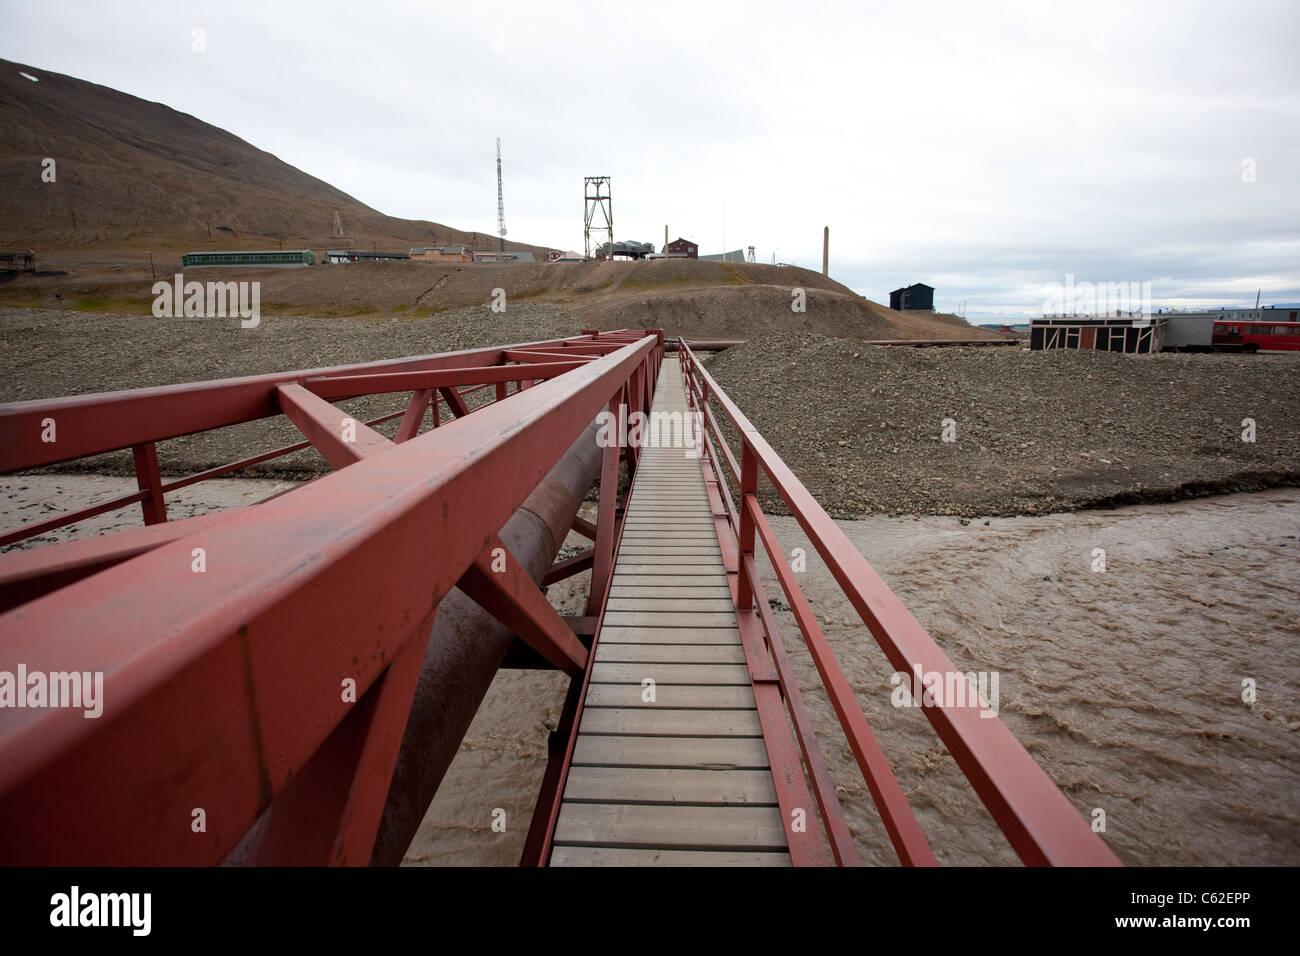 Image shows Longyearbyen, the largest settlement of Svalbard archipelago, Norway. Photo:Jeff Gilbert - Stock Image